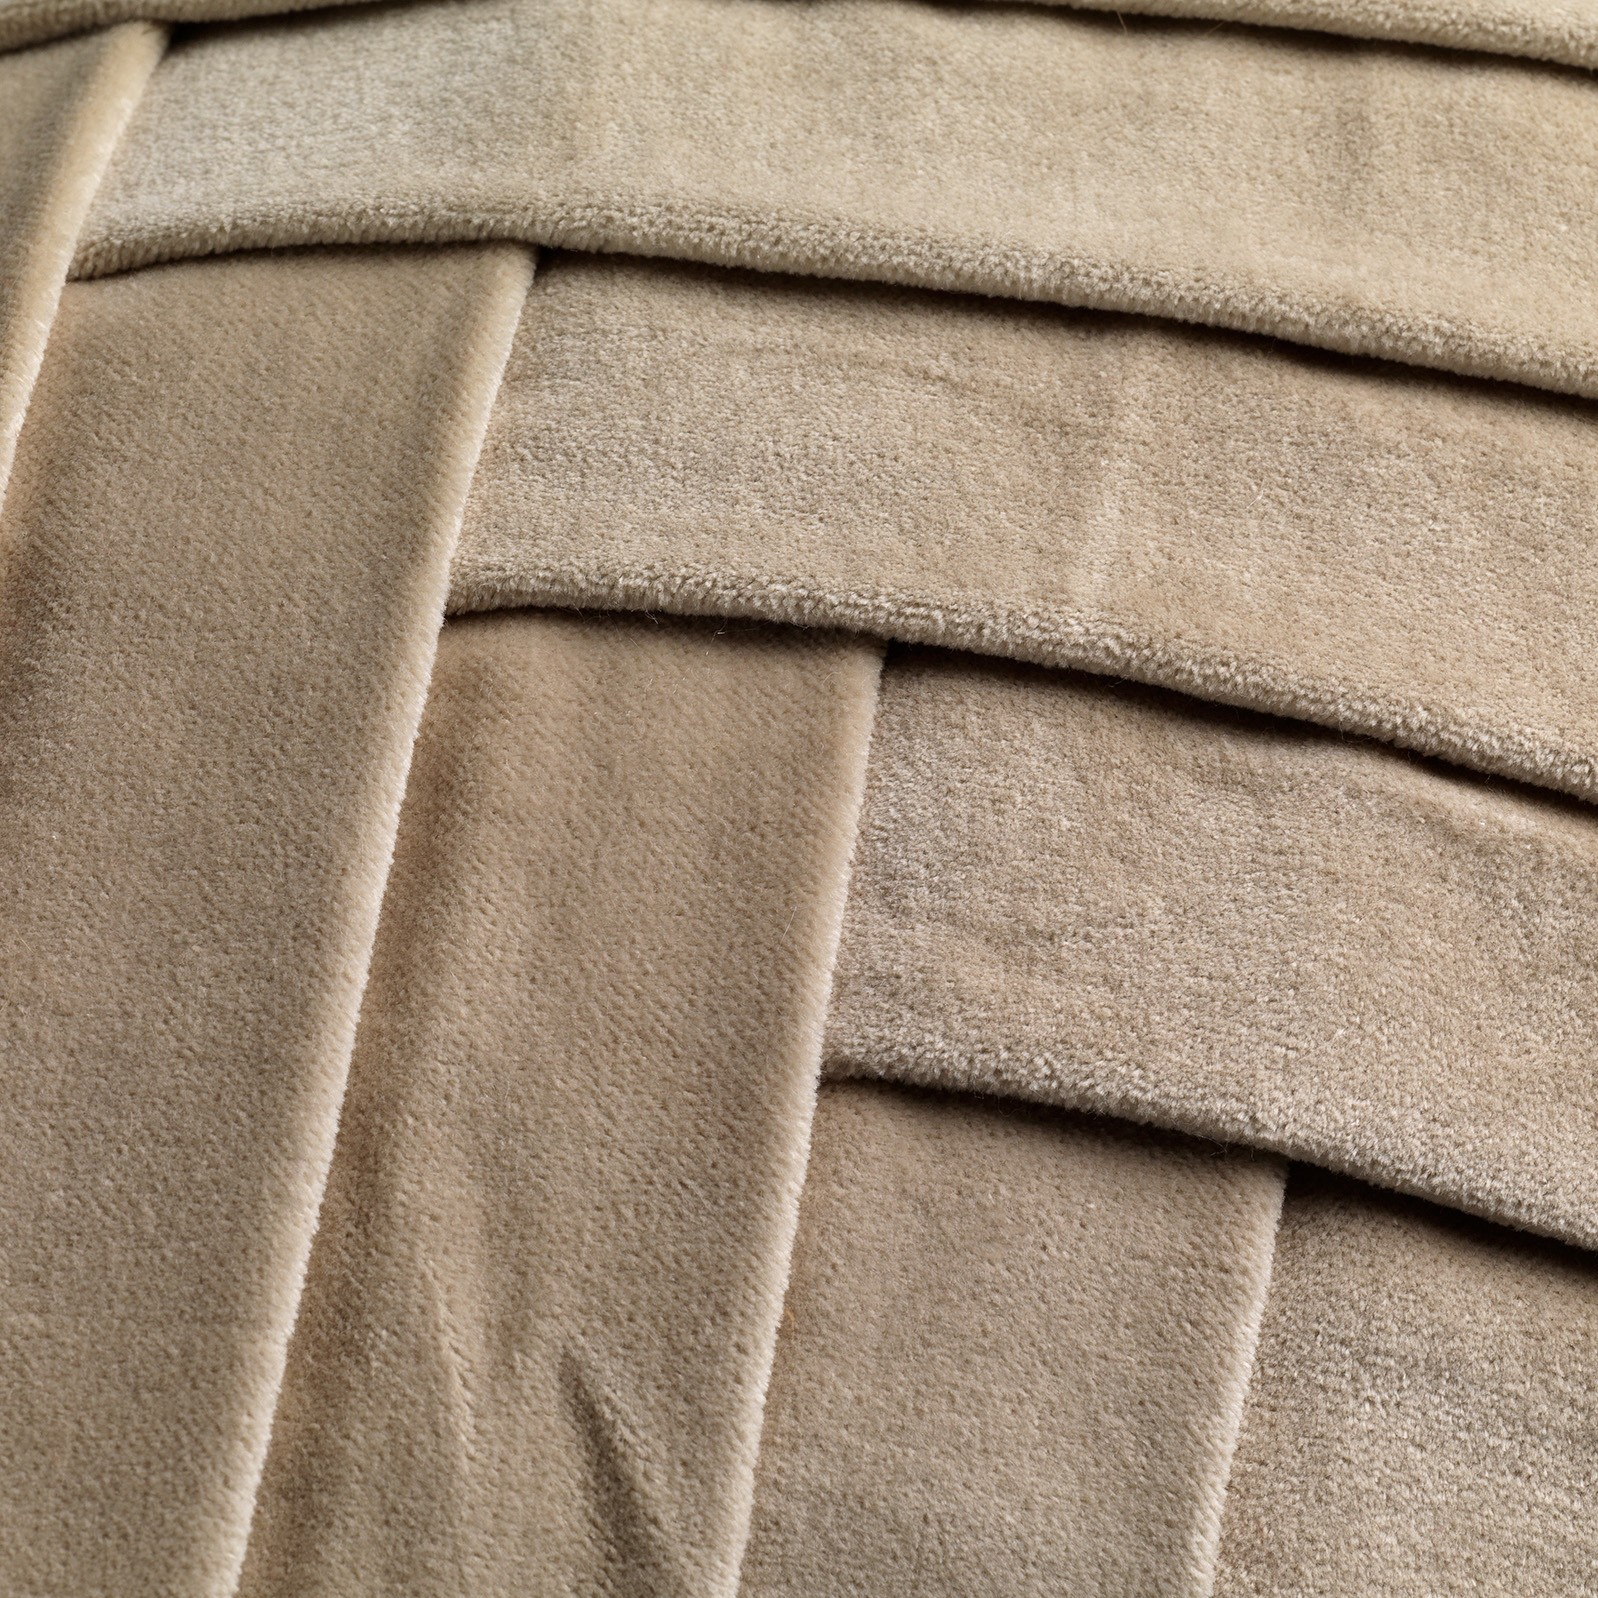 GIDI - Sierkussen velvet Pumice Stone 45x45 cm